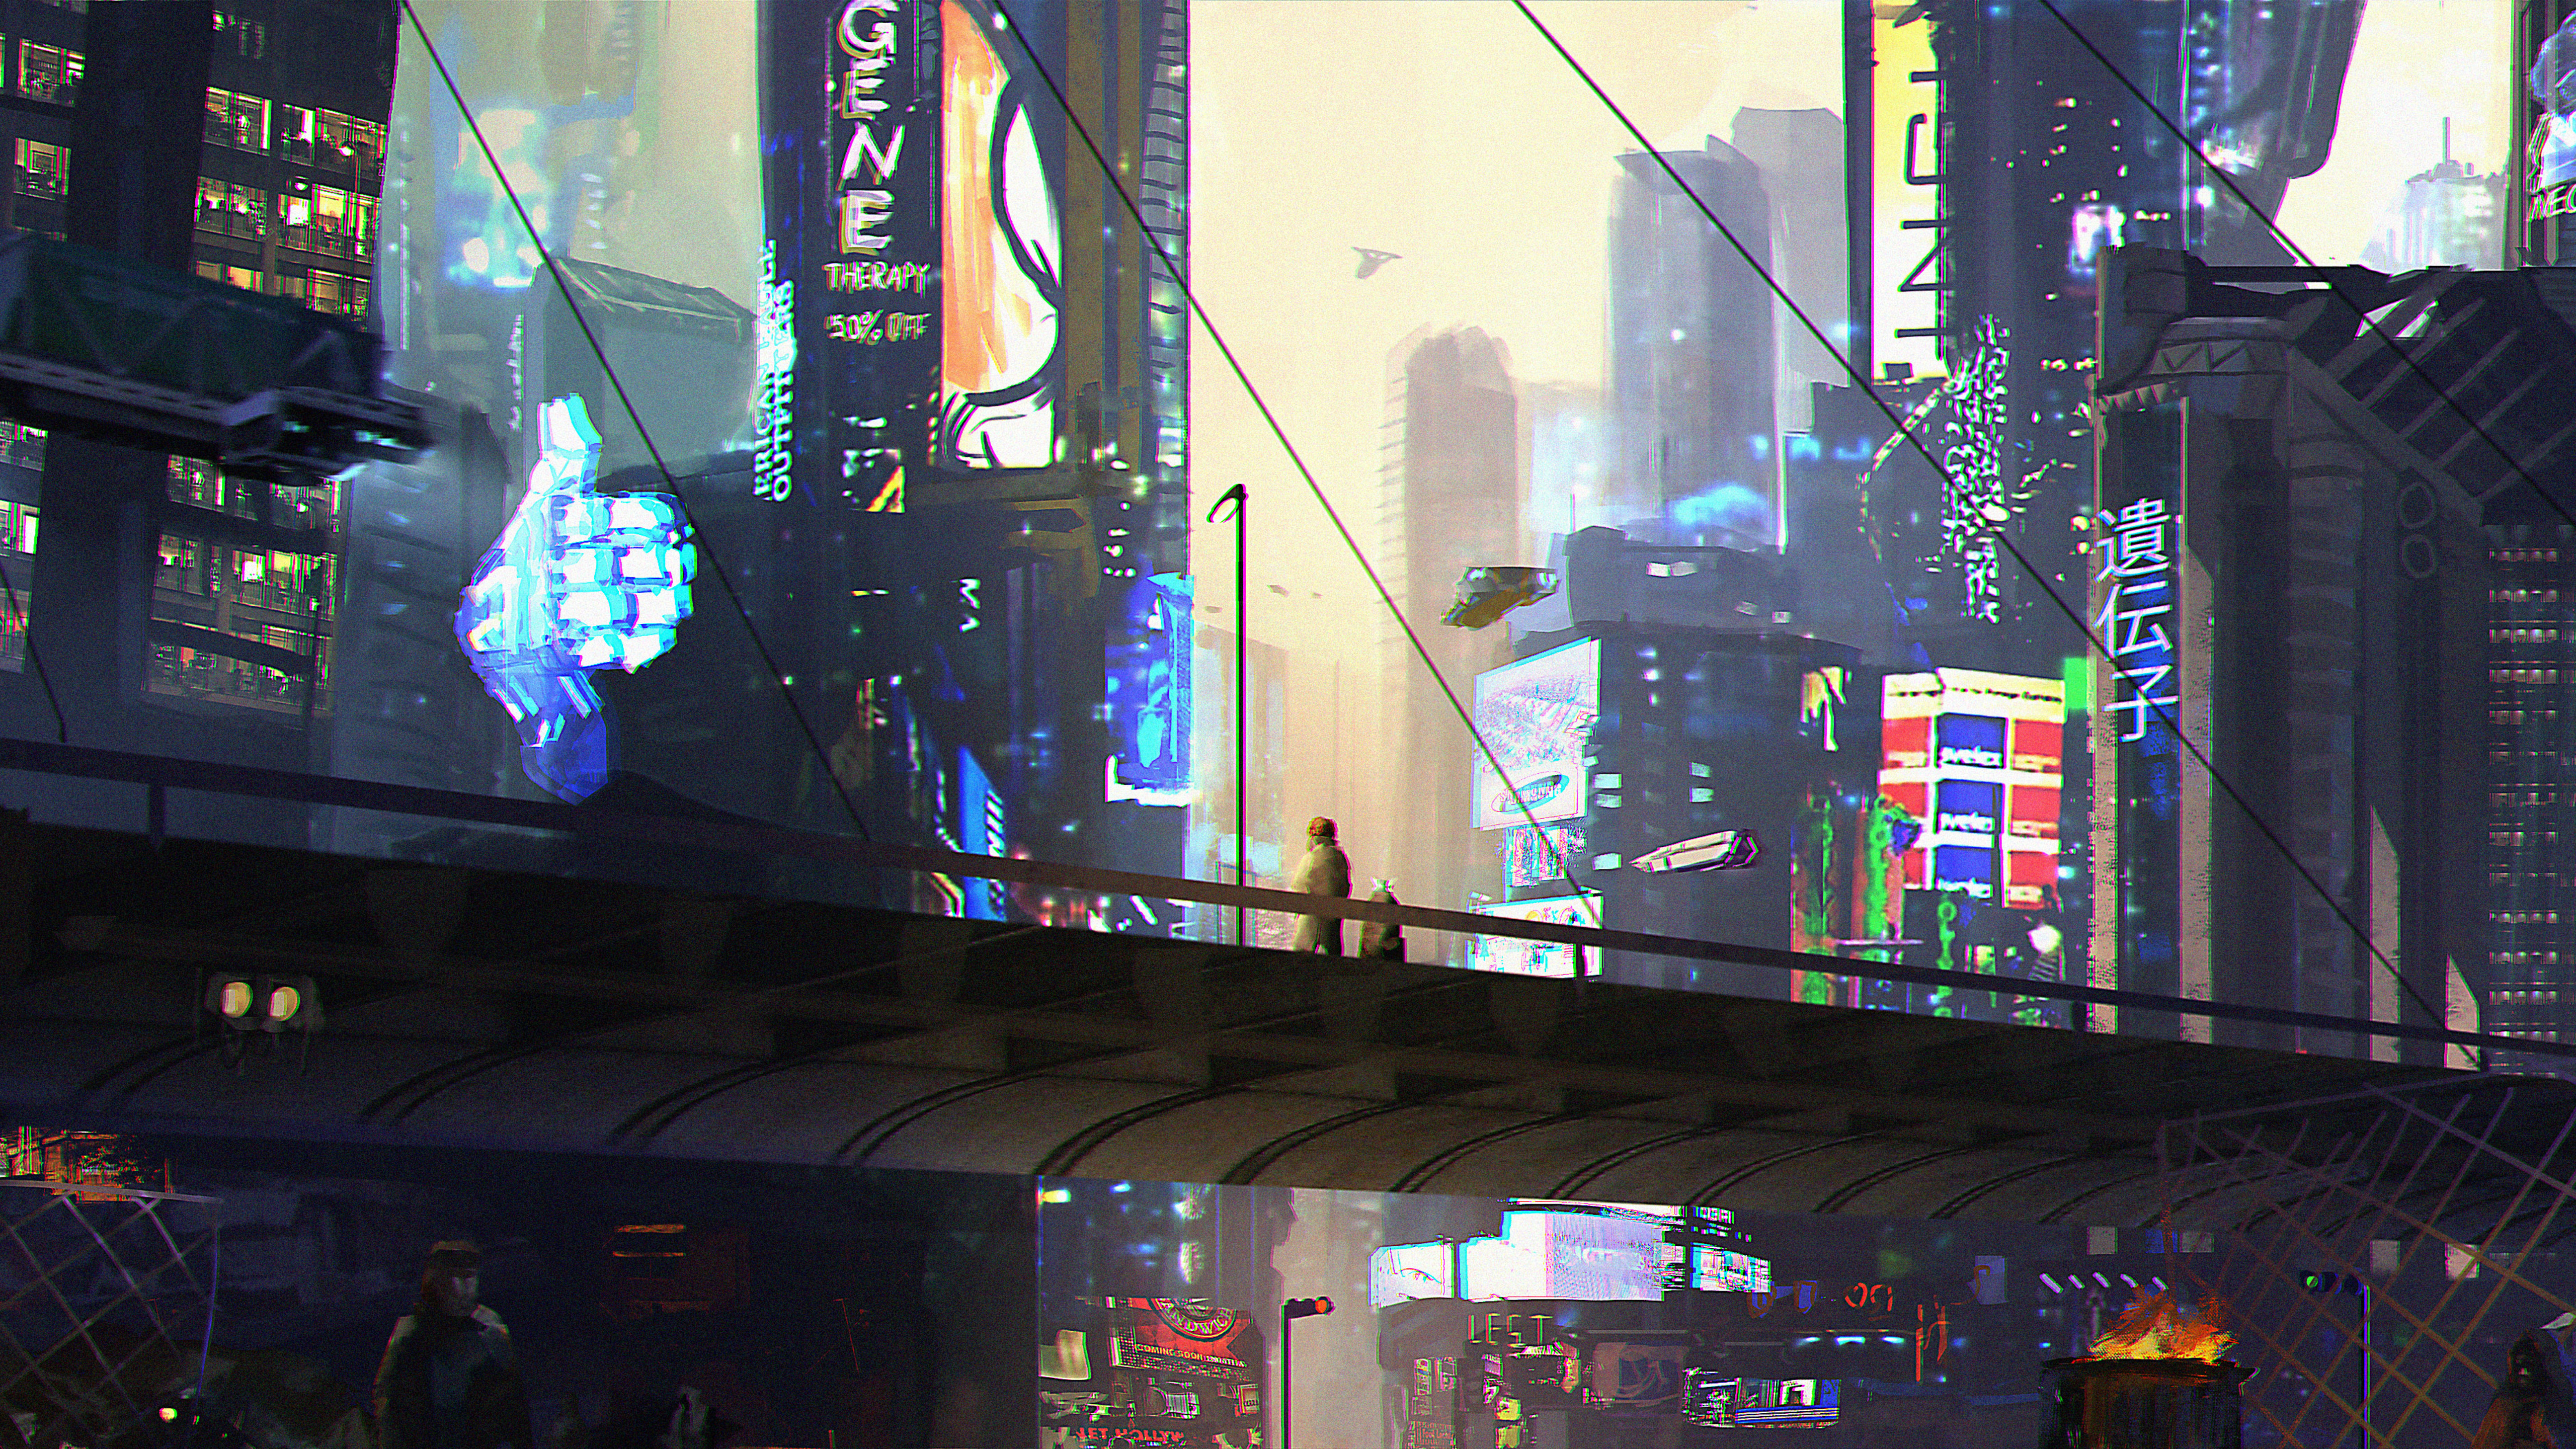 night-time-scifi-science-fiction-5k-f1.jpg